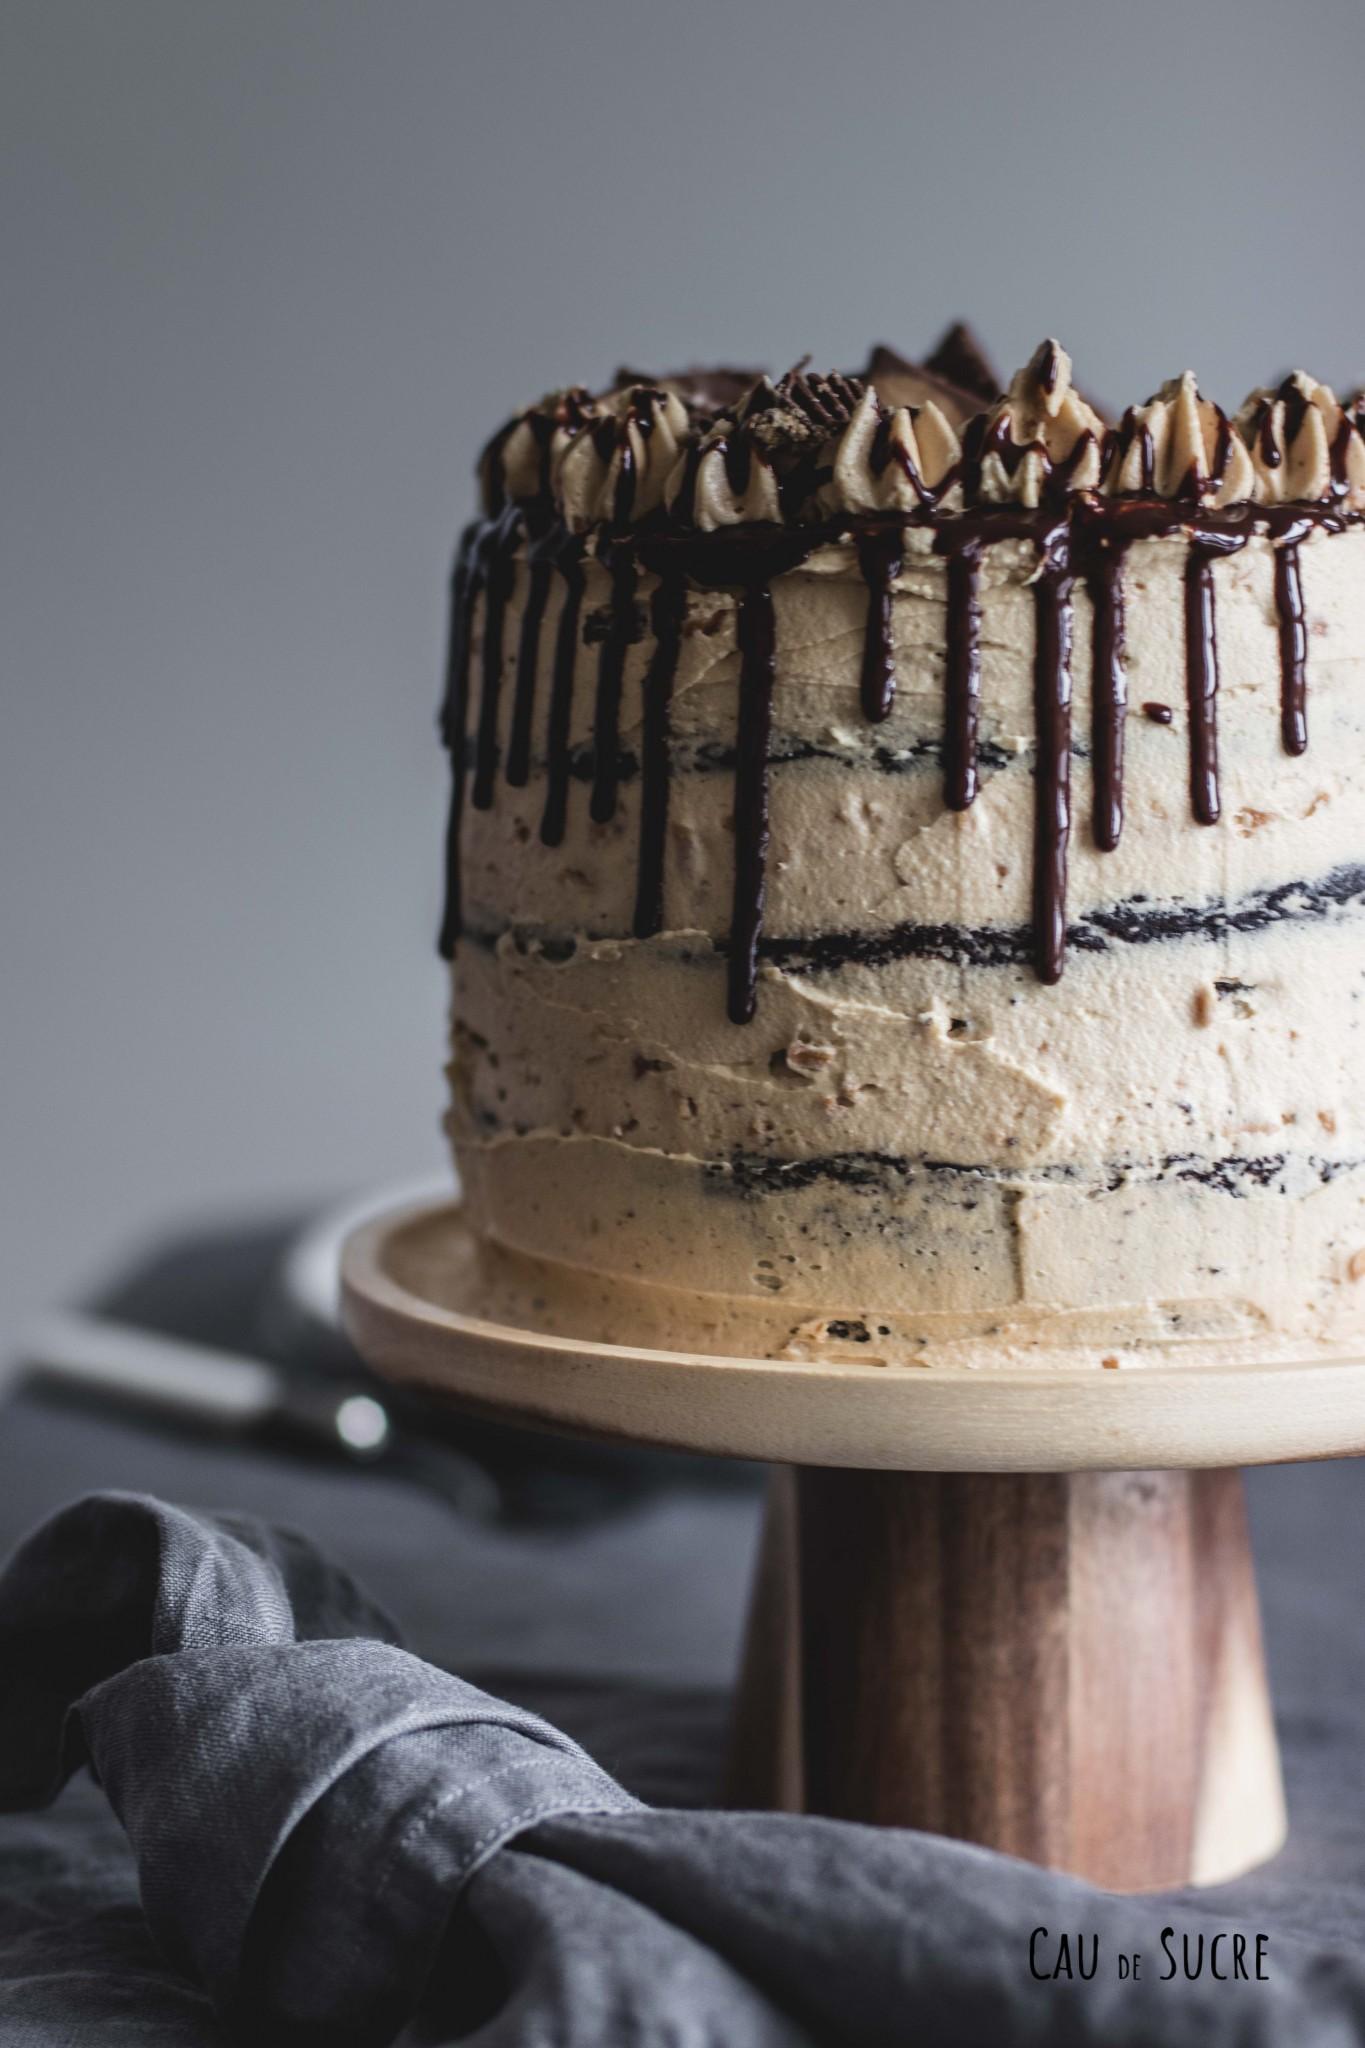 peanutbutter_chocolate_cake-9